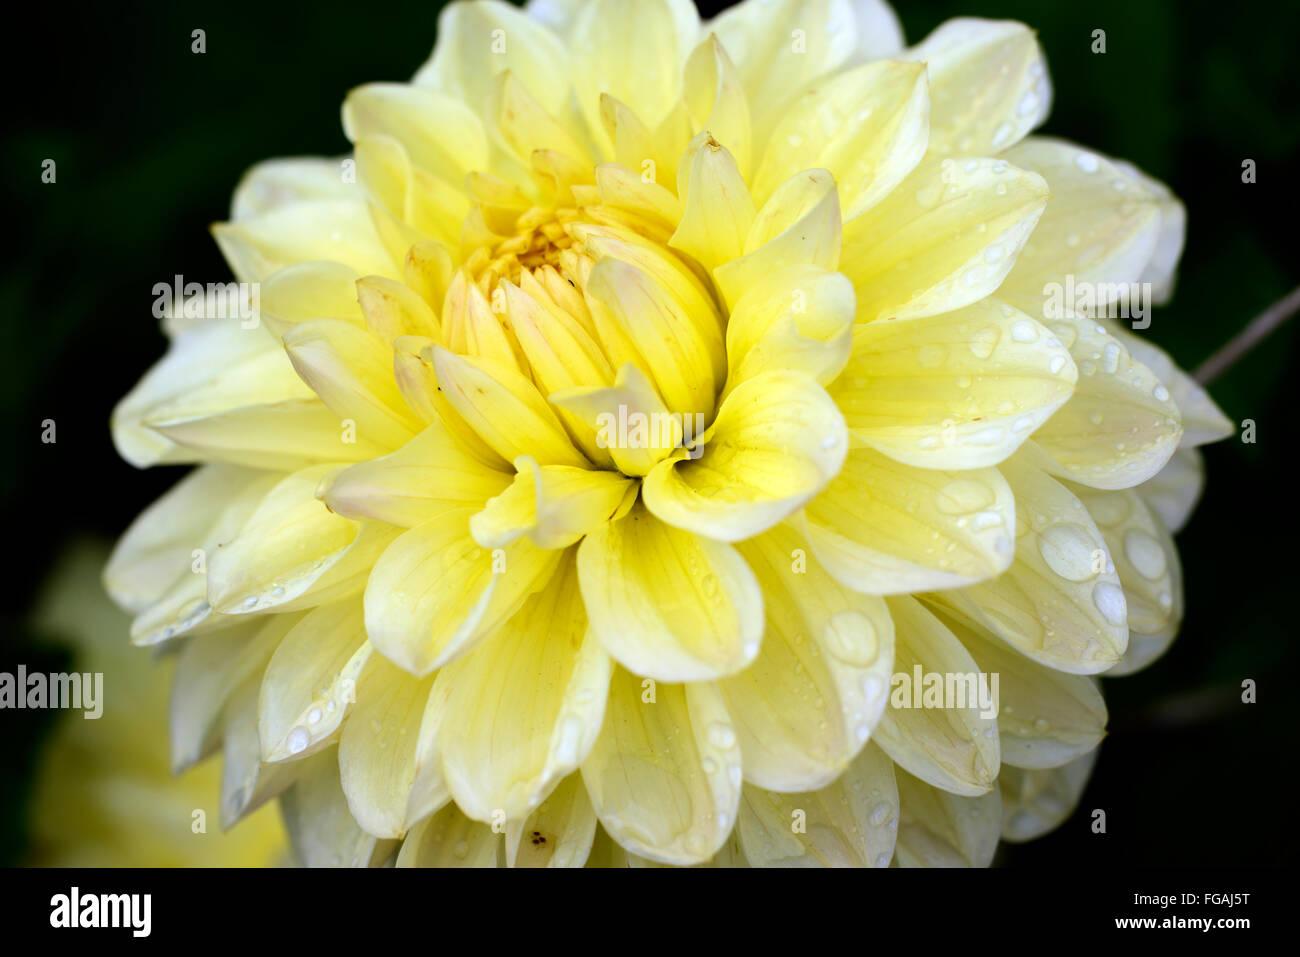 Dahlia darraghs delight cream dahlias flower flowers bloom blossom dahlia darraghs delight cream dahlias flower flowers bloom blossom perennial tuber tuberous plant rm floral izmirmasajfo